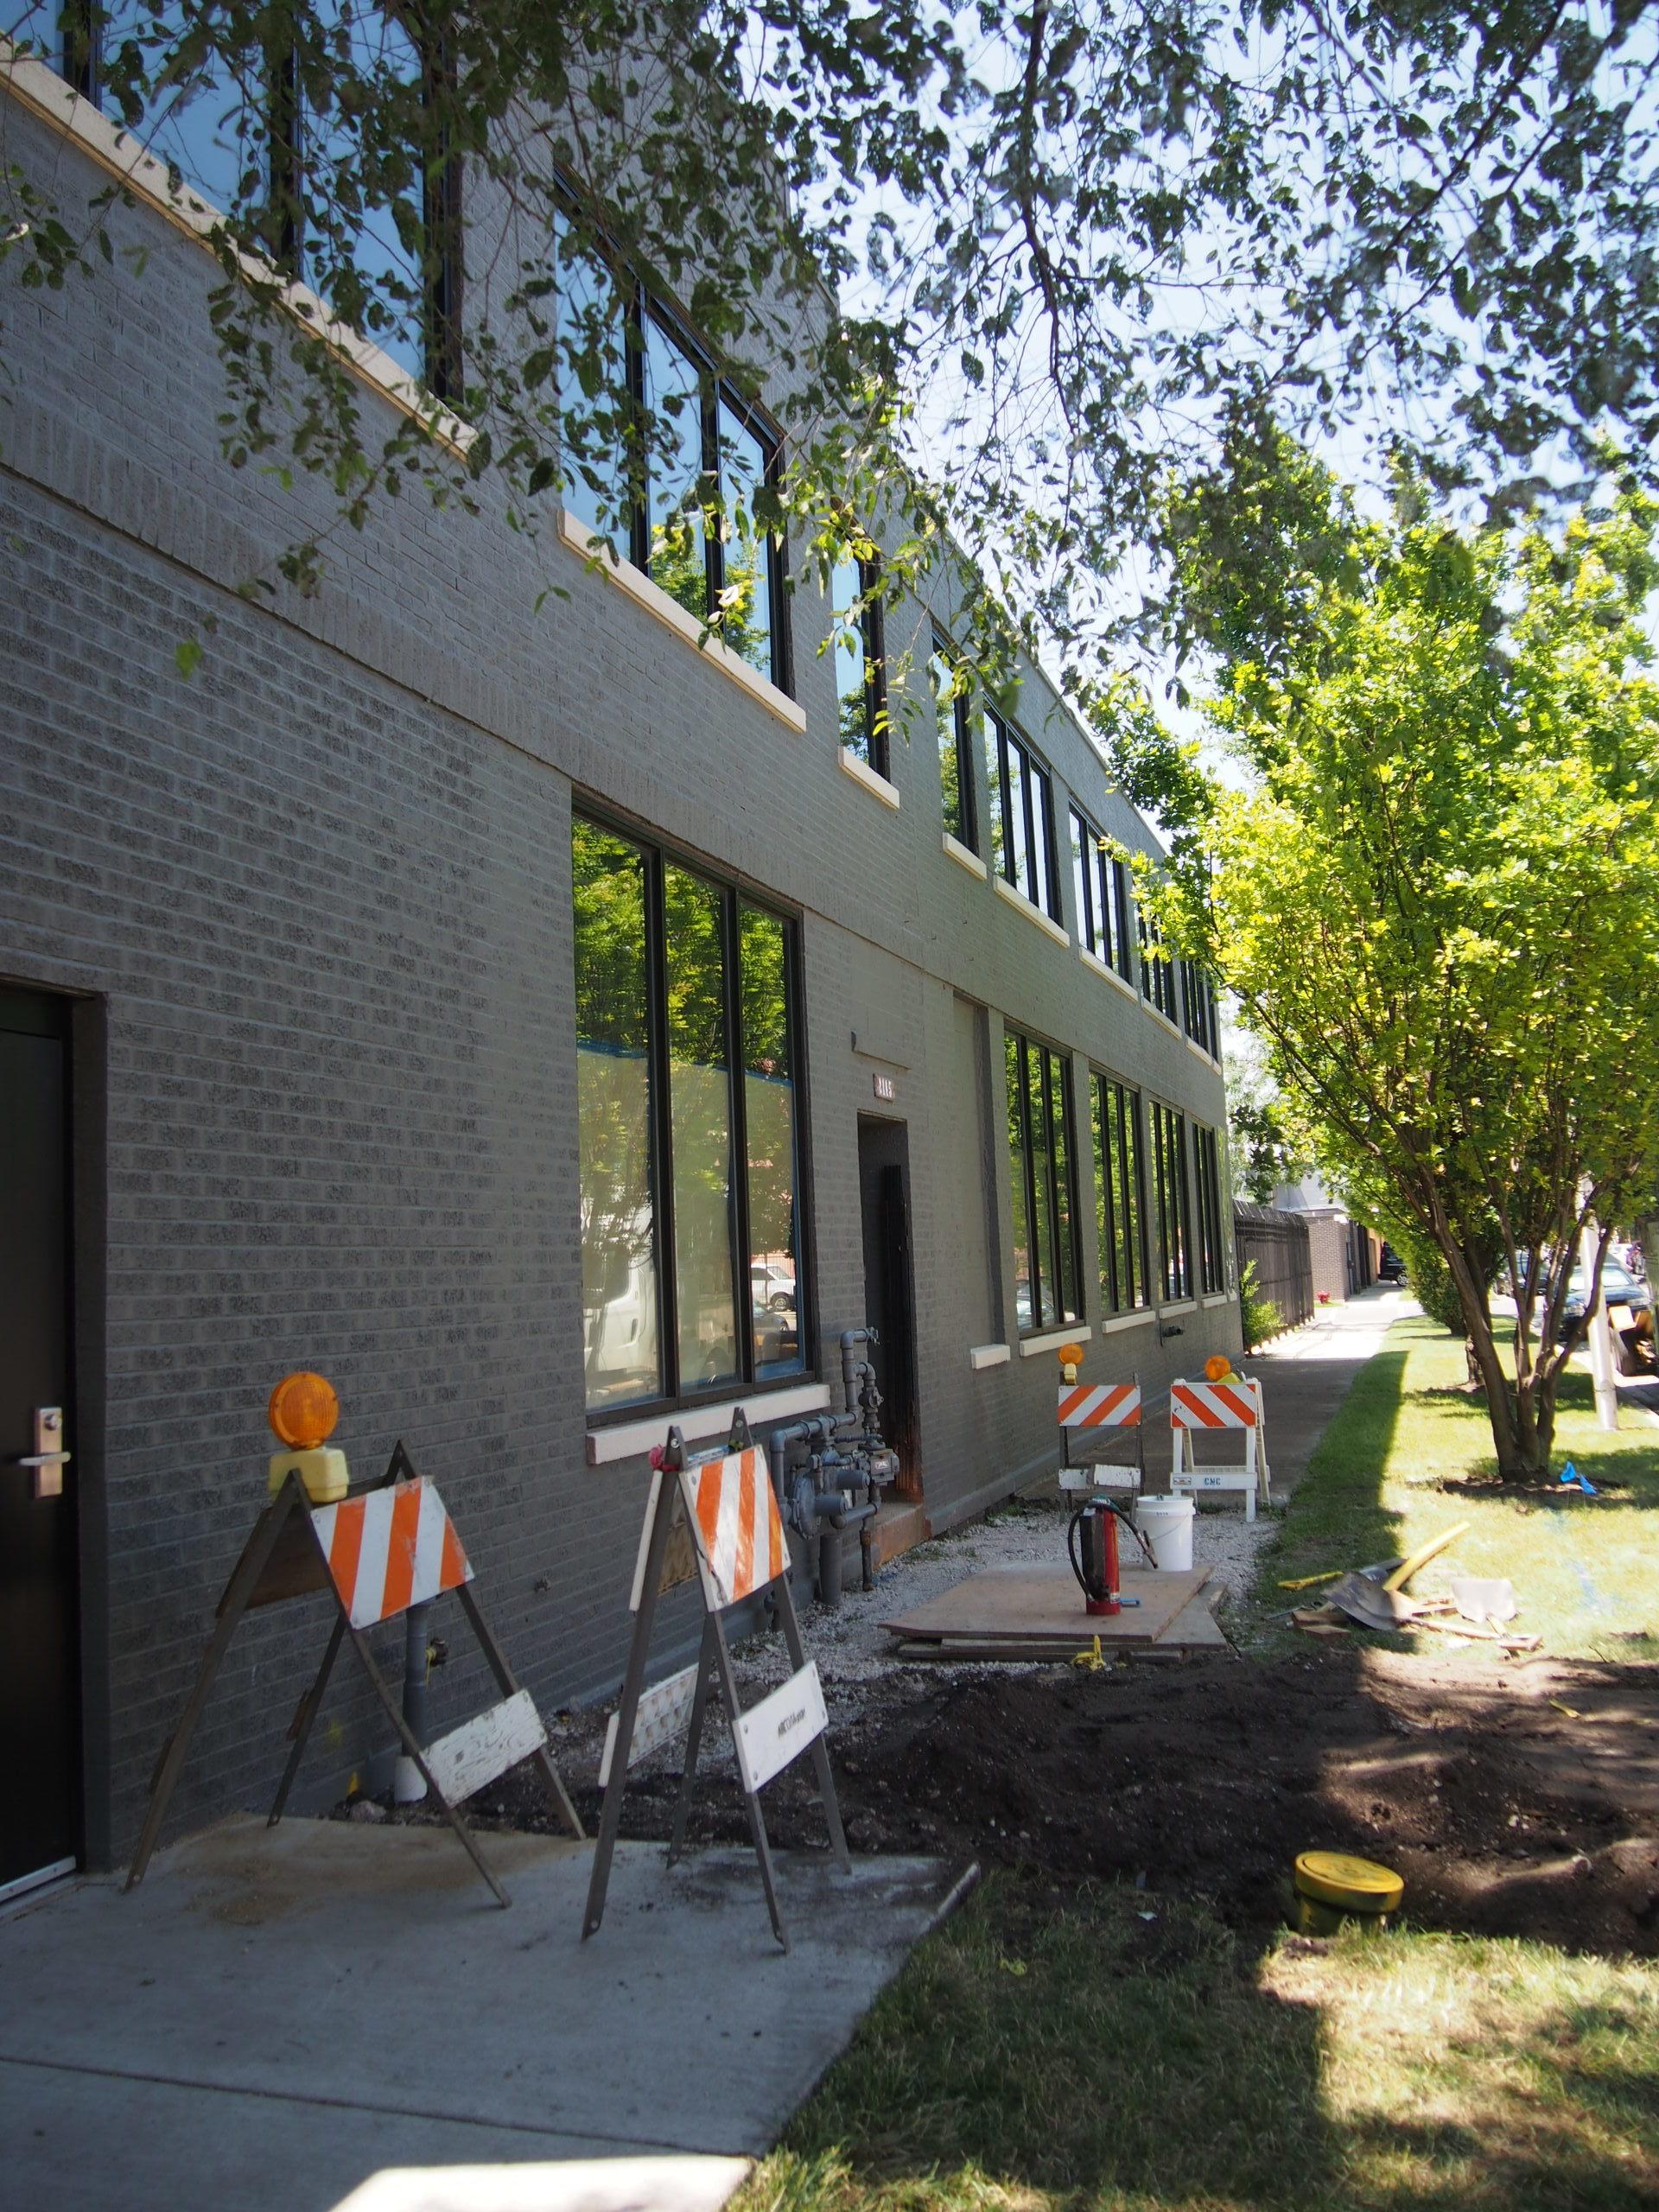 Copy of Building Exterior